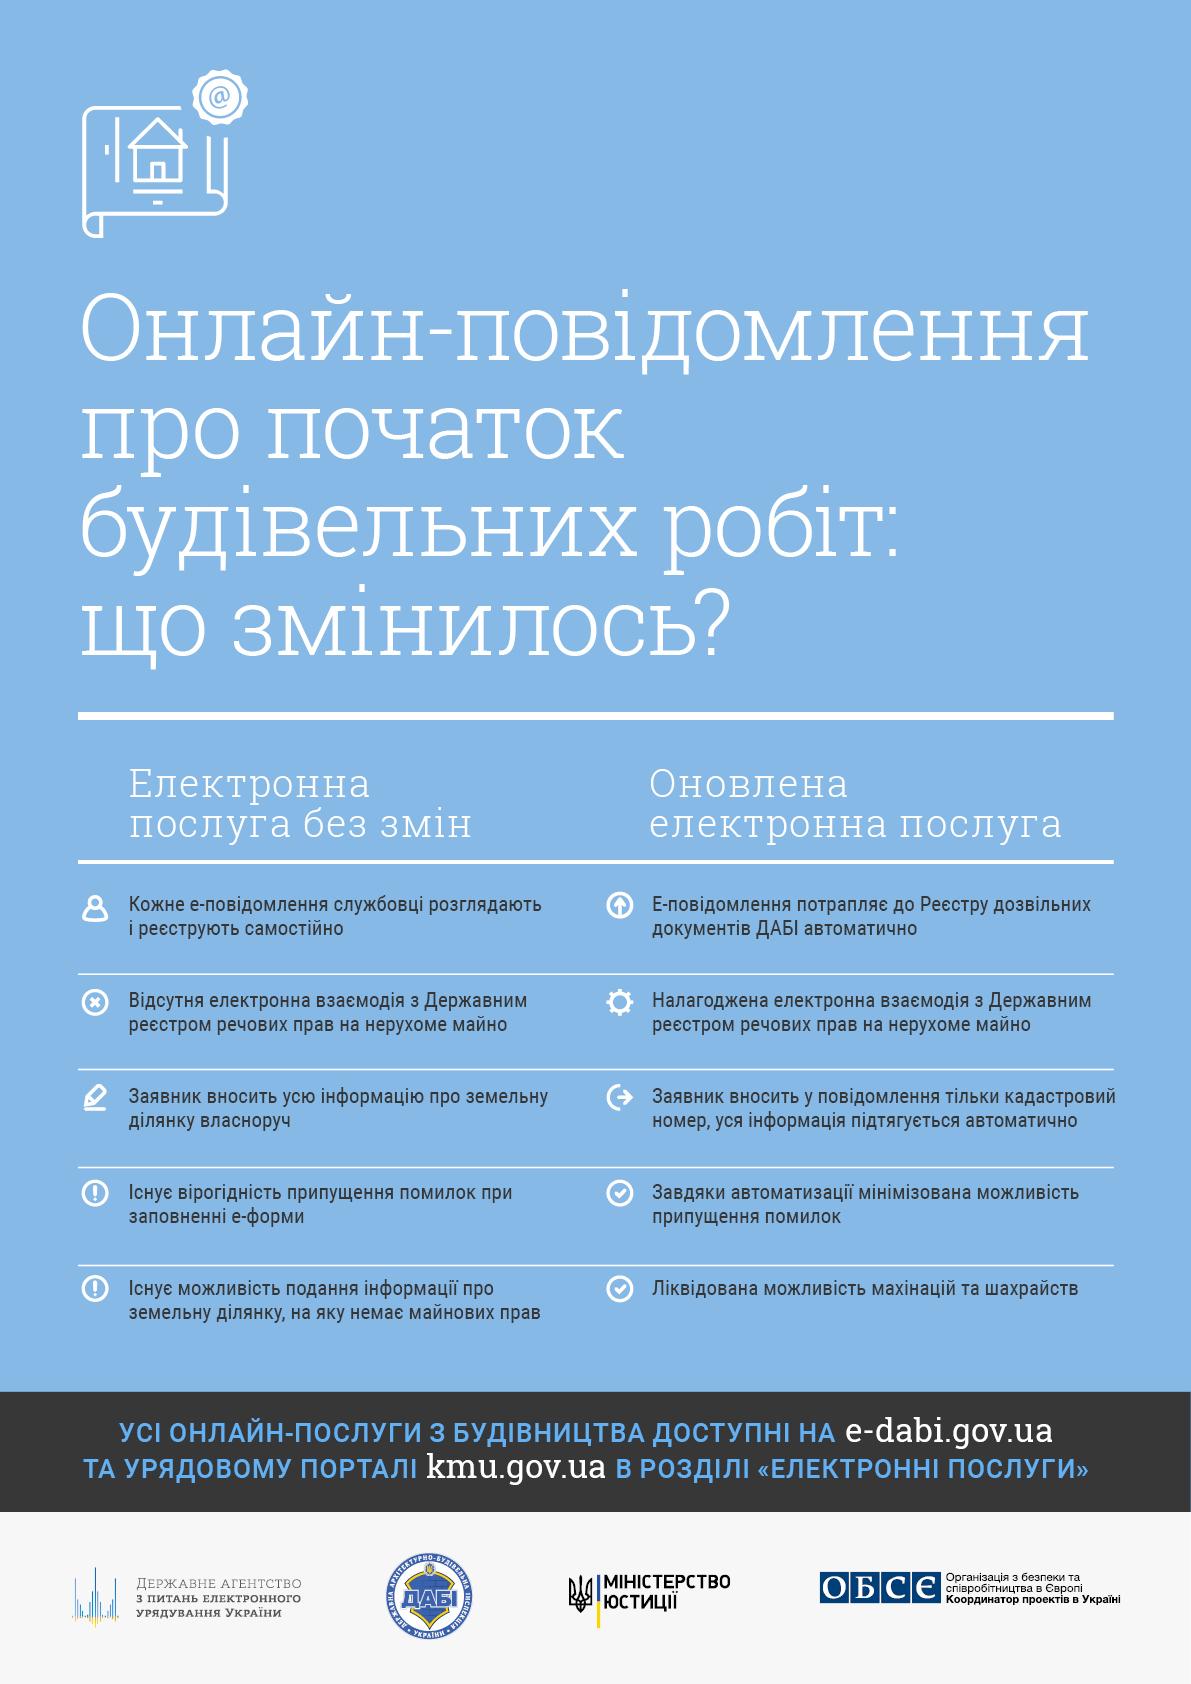 infographic_for_zmi_innovations.jpg